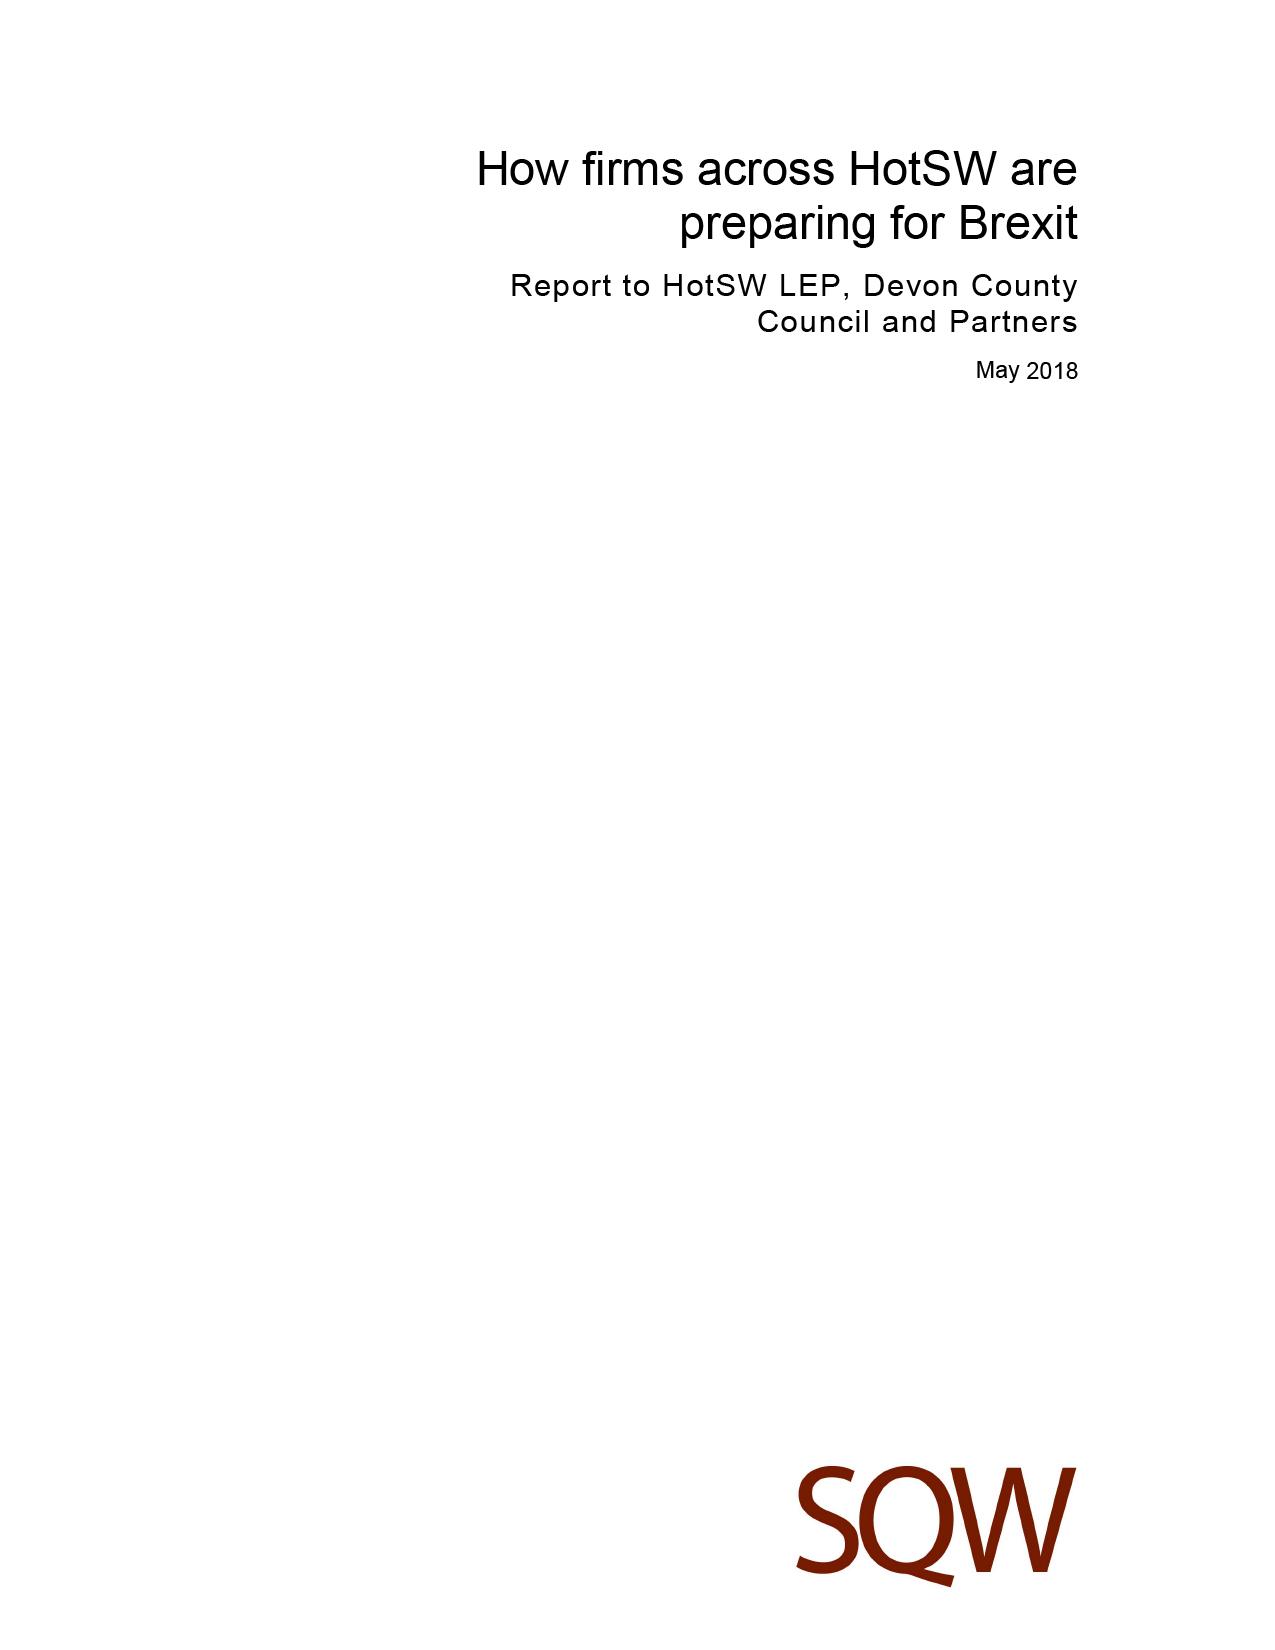 Microsoft Word - HotSW Brexit Report - DRAFT - 04.05.18